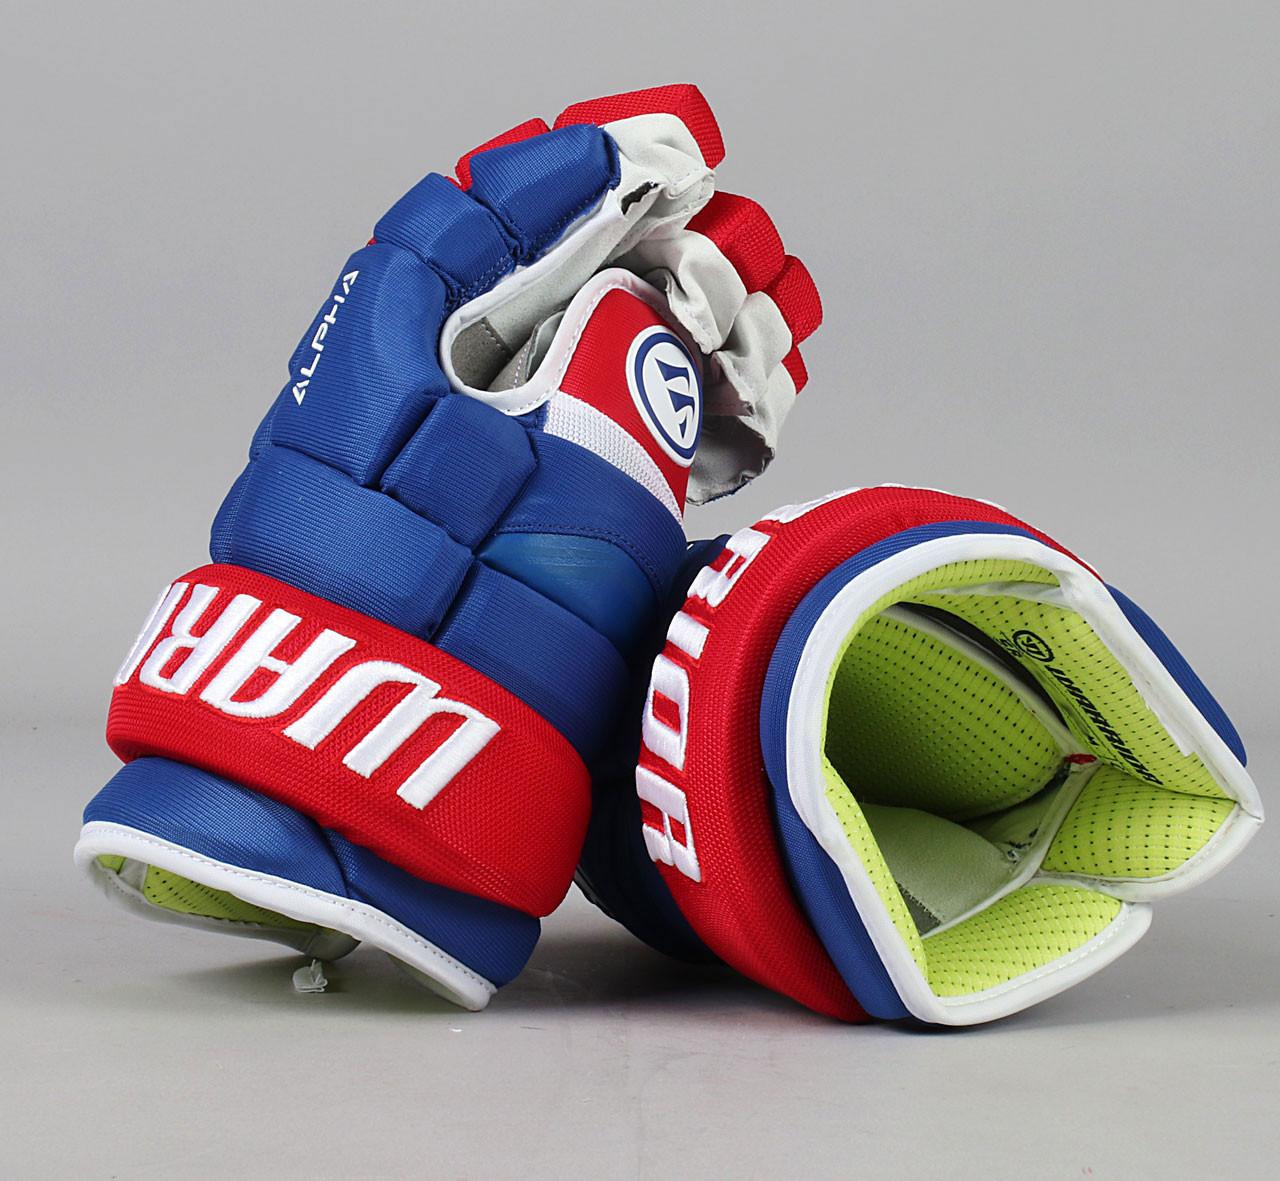 13 Warrior Alpha Qx Gloves Team Stock Montreal Canadiens 4 Pro Stock Hockey